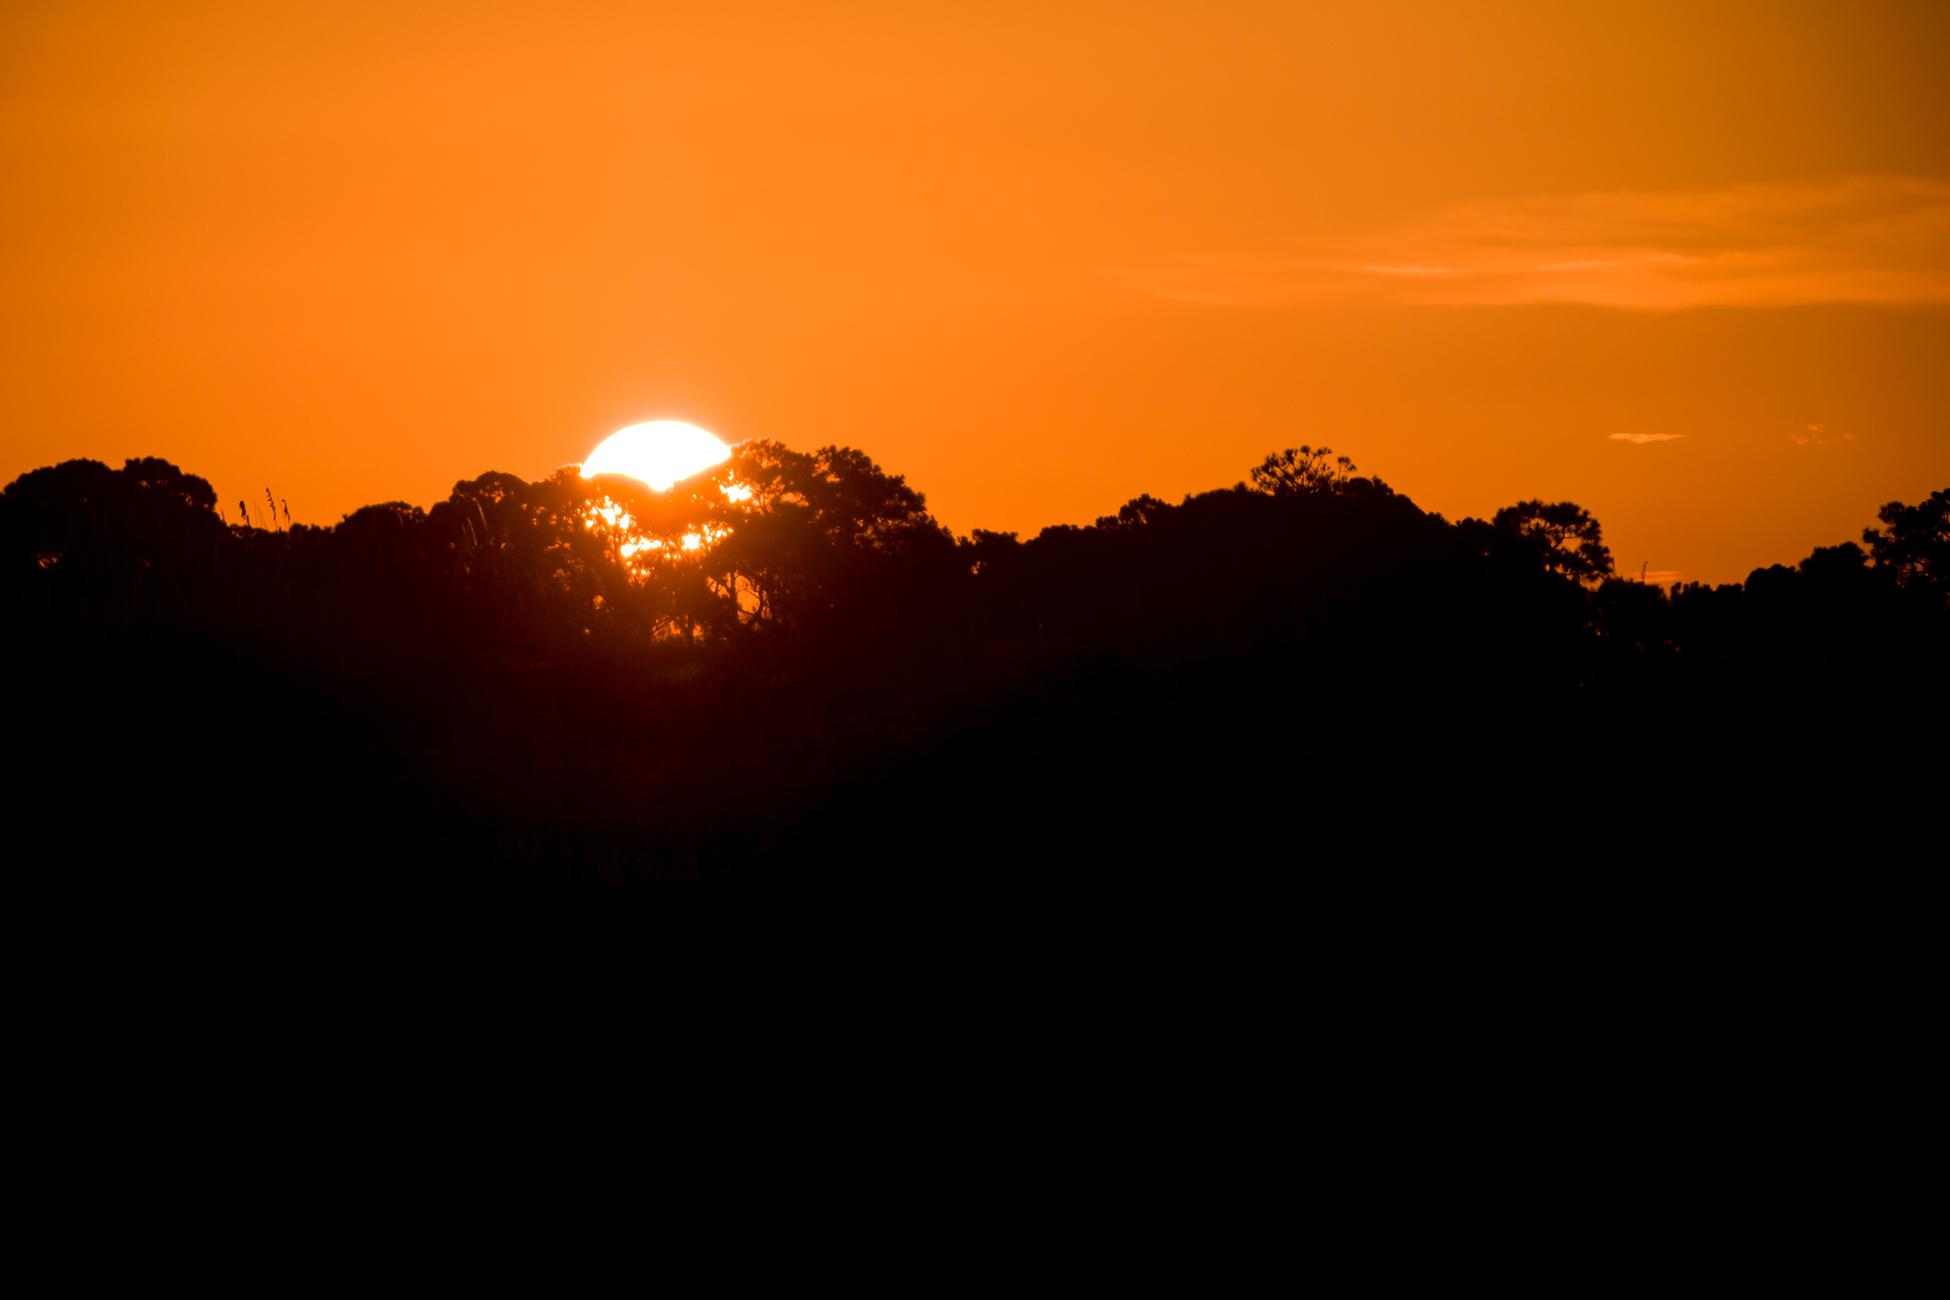 Sunrise over the dunes.